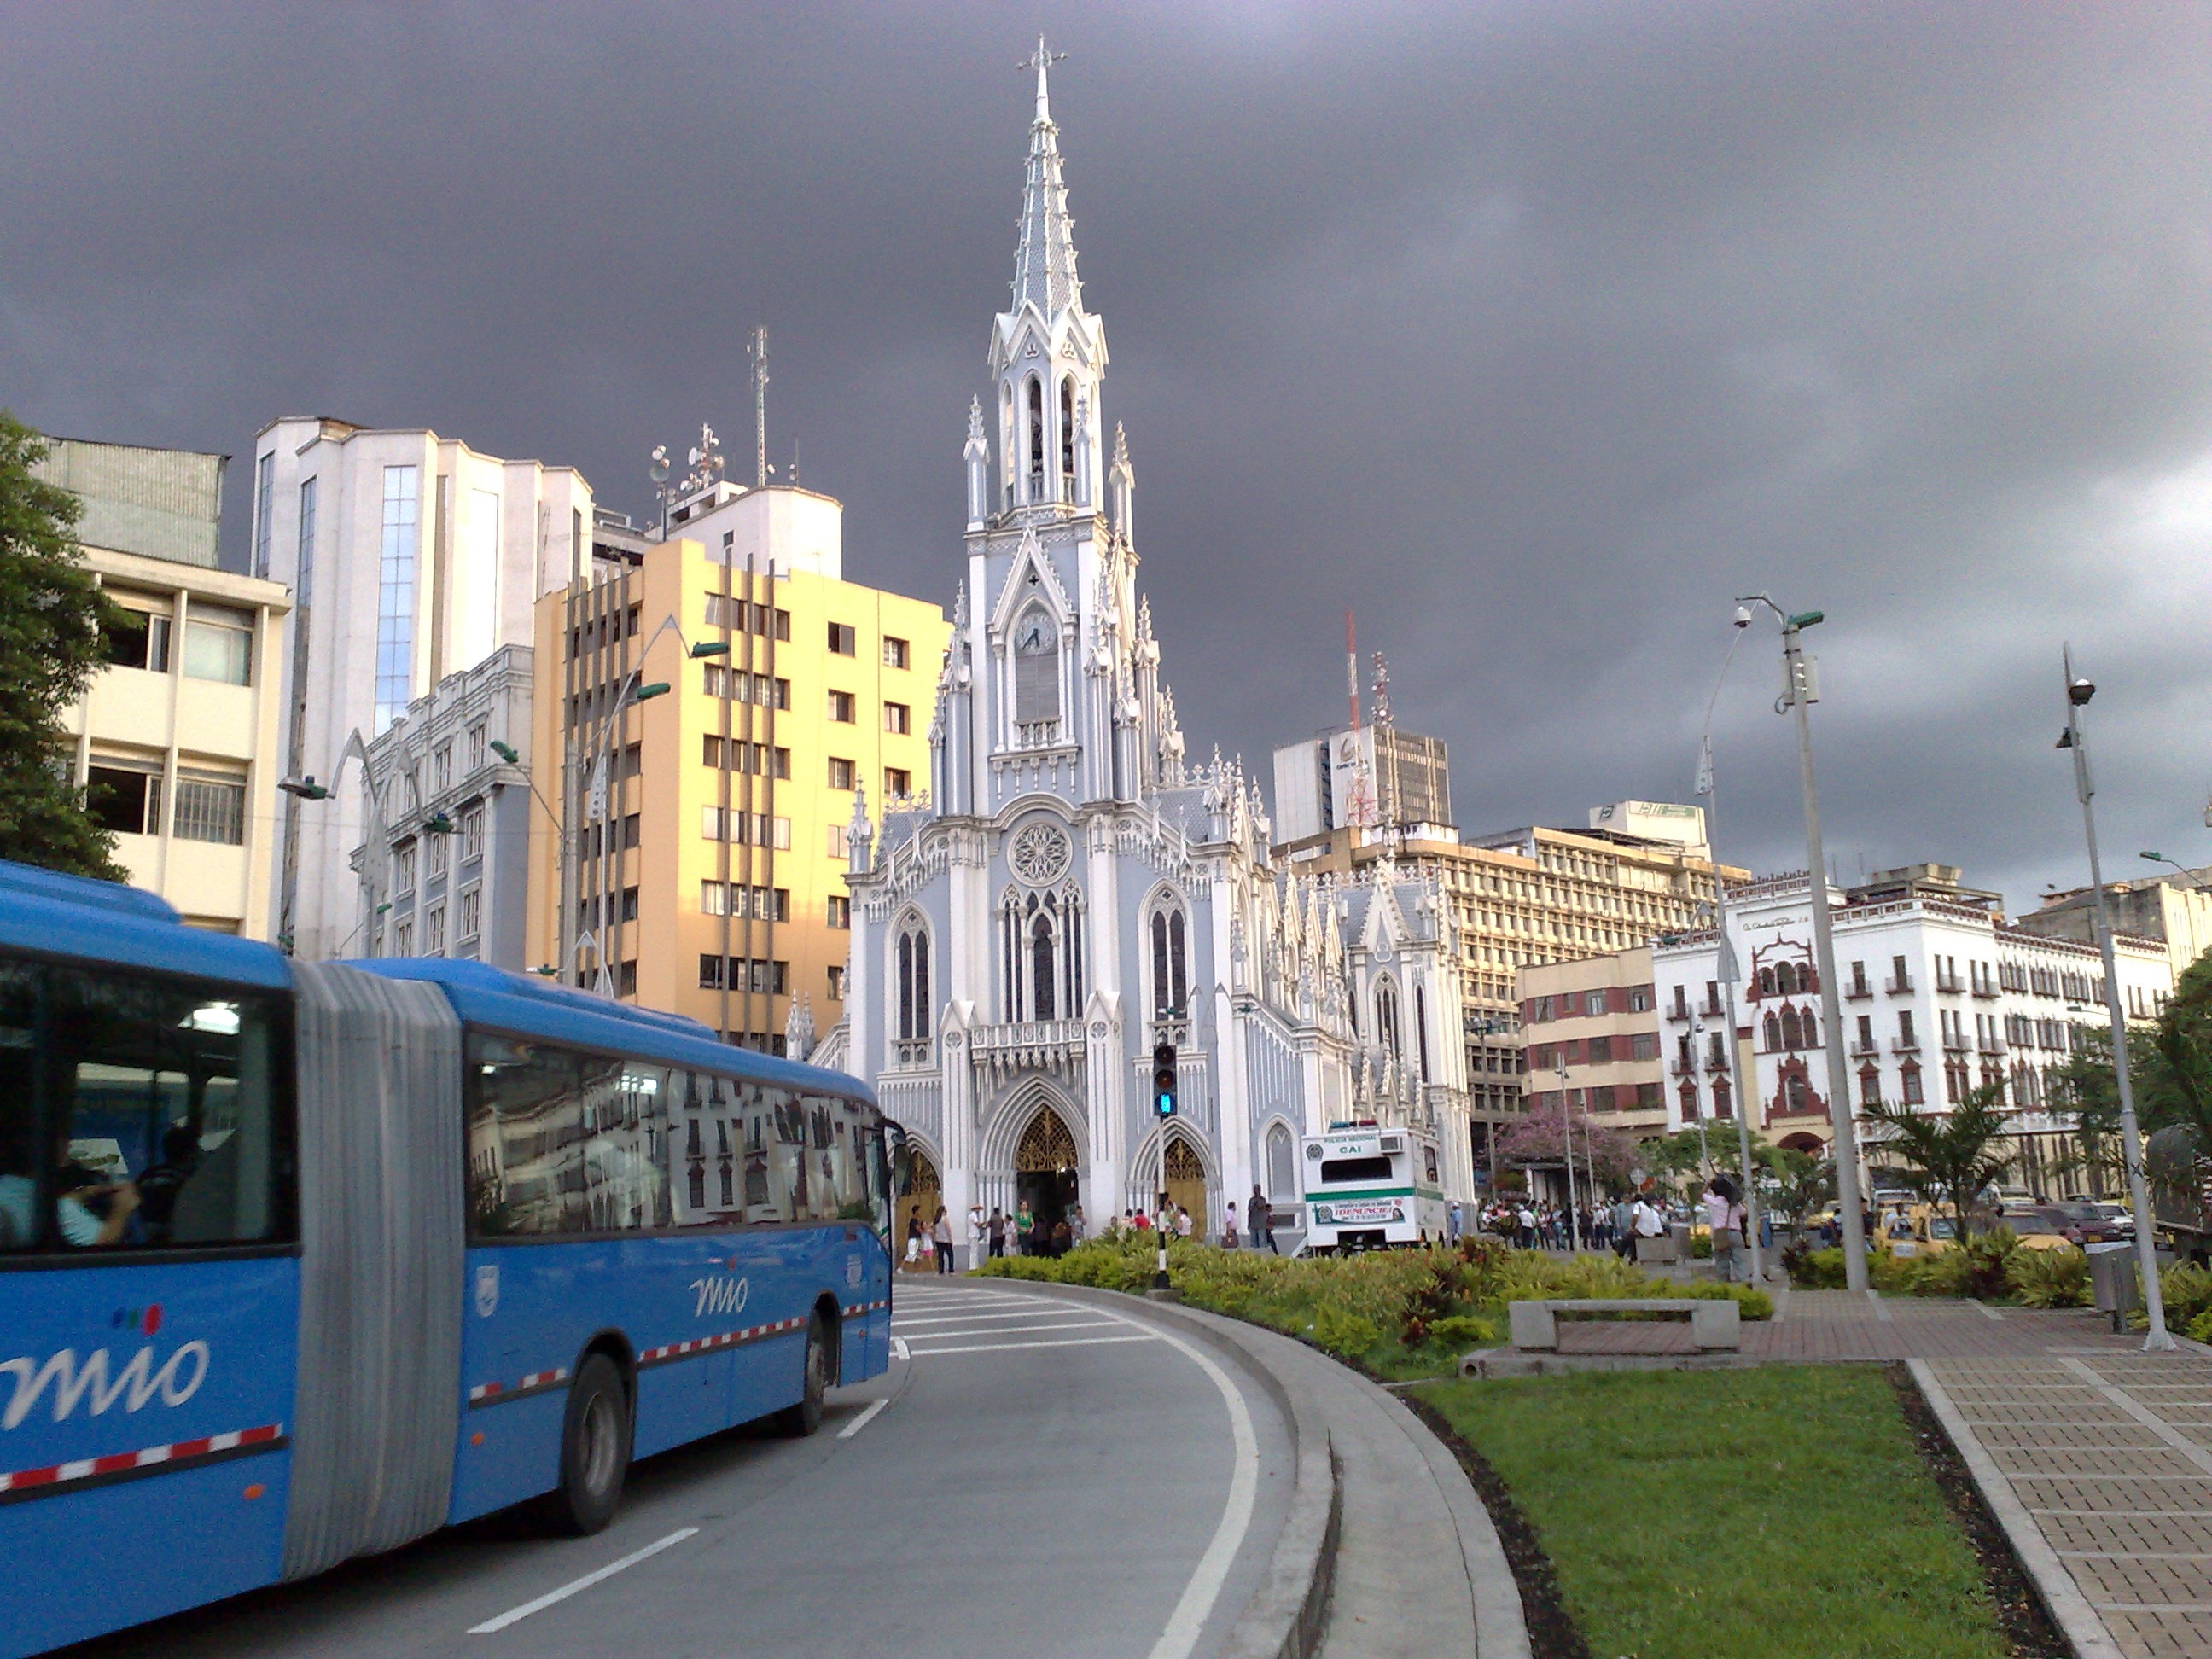 https://upload.wikimedia.org/wikipedia/commons/9/94/Iglesia_La_Ermita_en_Cali,_Colombia.jpg